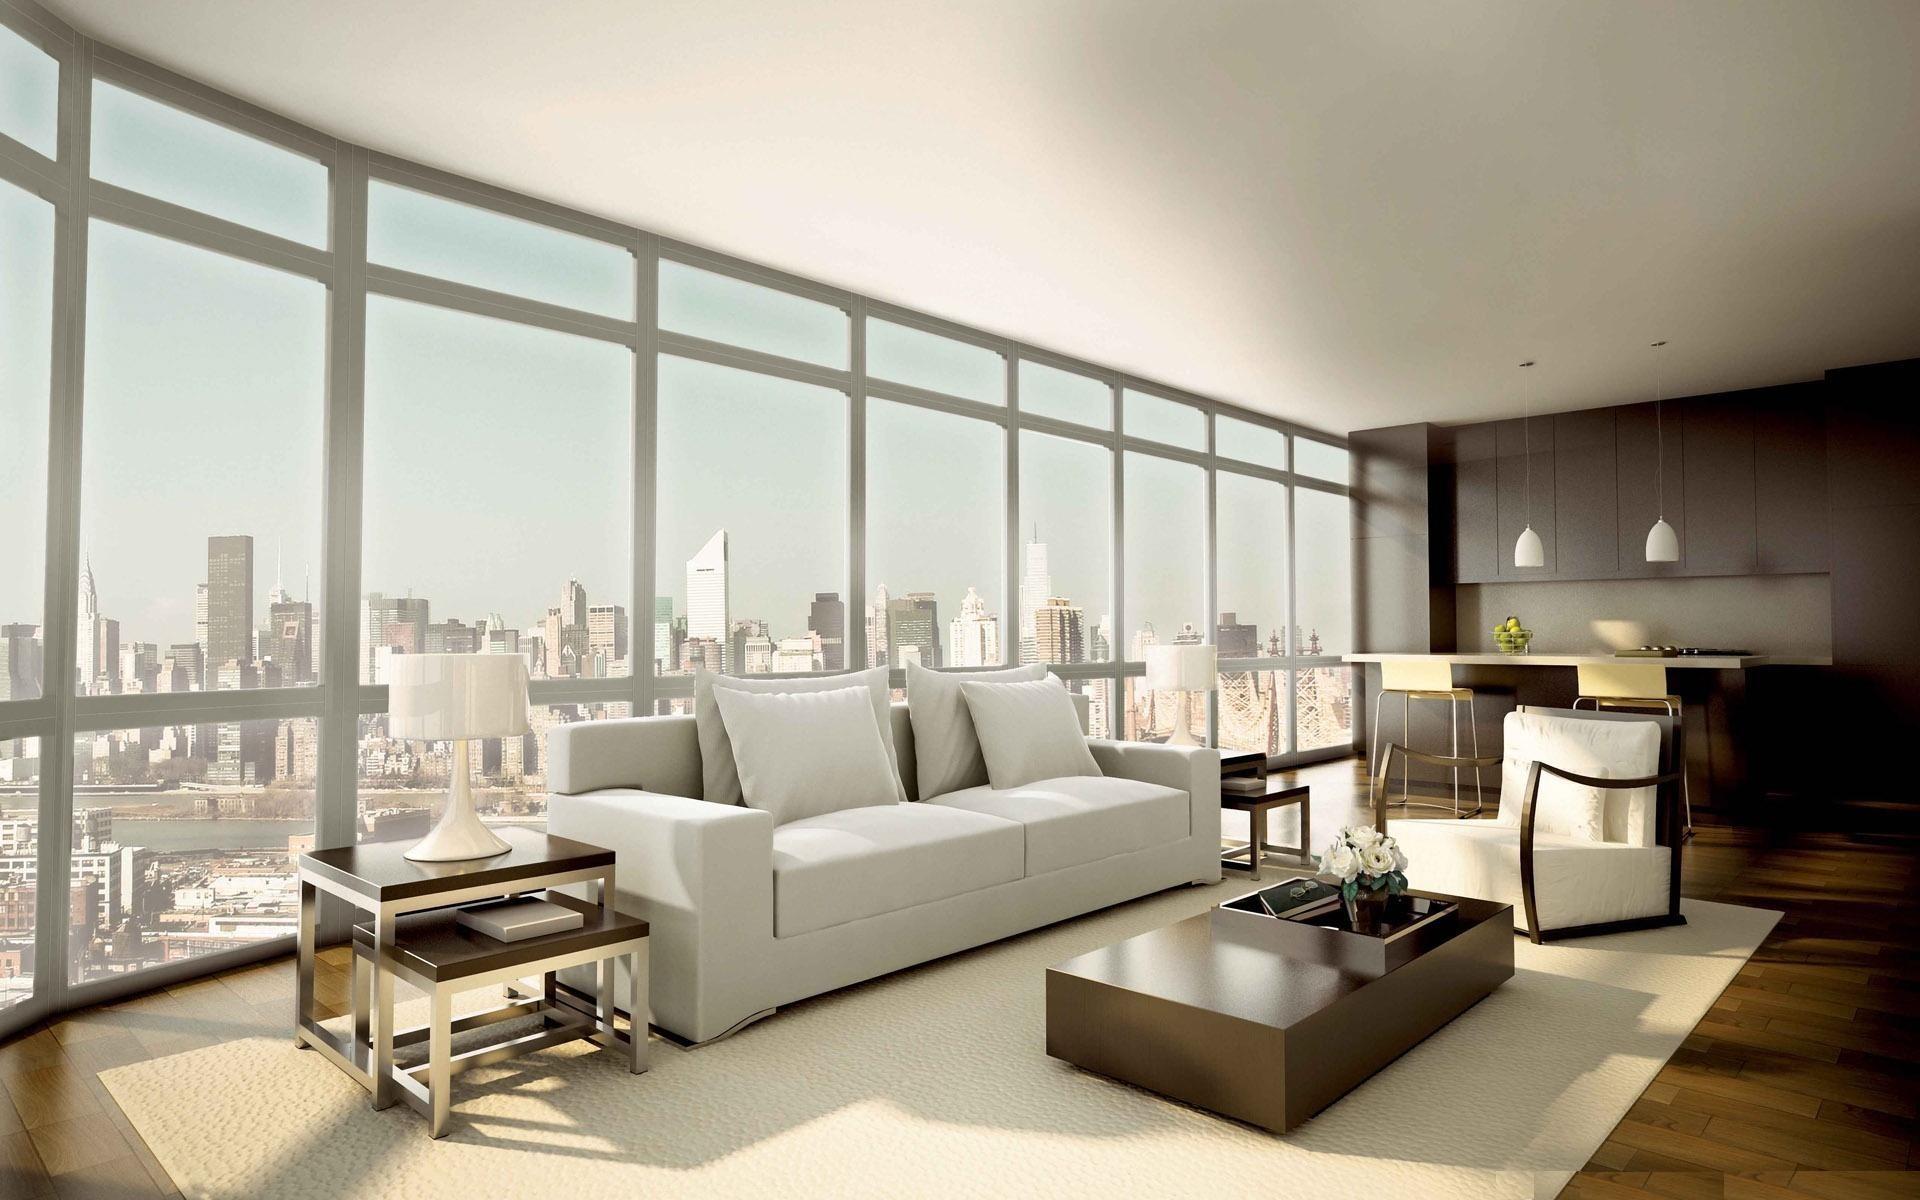 Flat Interior Design Wallpaper HD Wallpapers 1920x1200